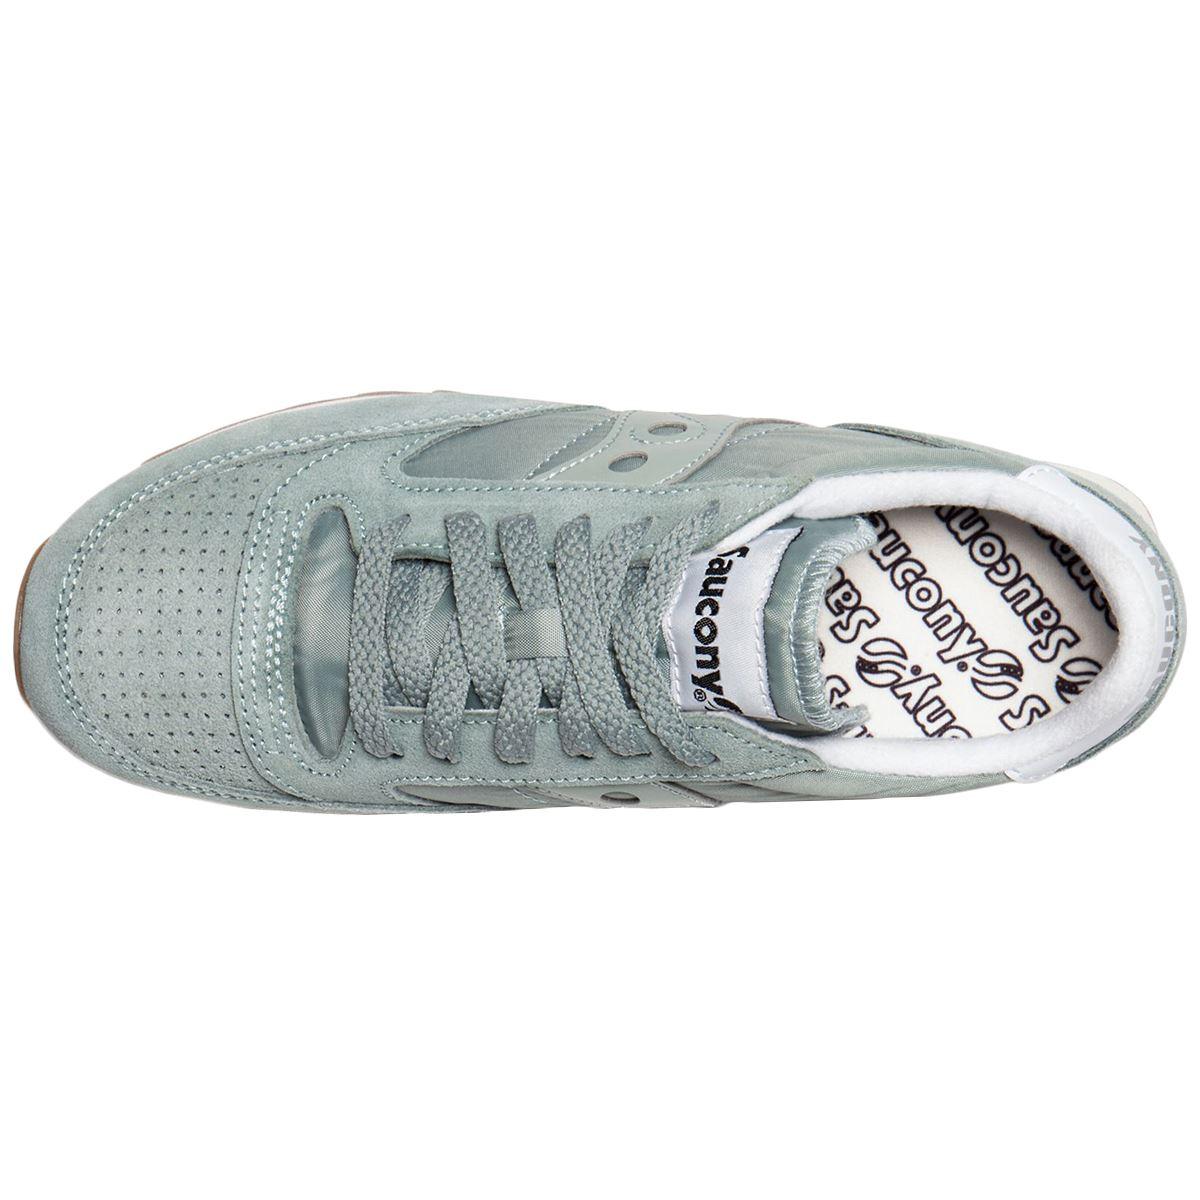 Saucony Saucony Saucony Jazz Original Vintage Suede Textile Sneakers Womens Trainers 826e2b